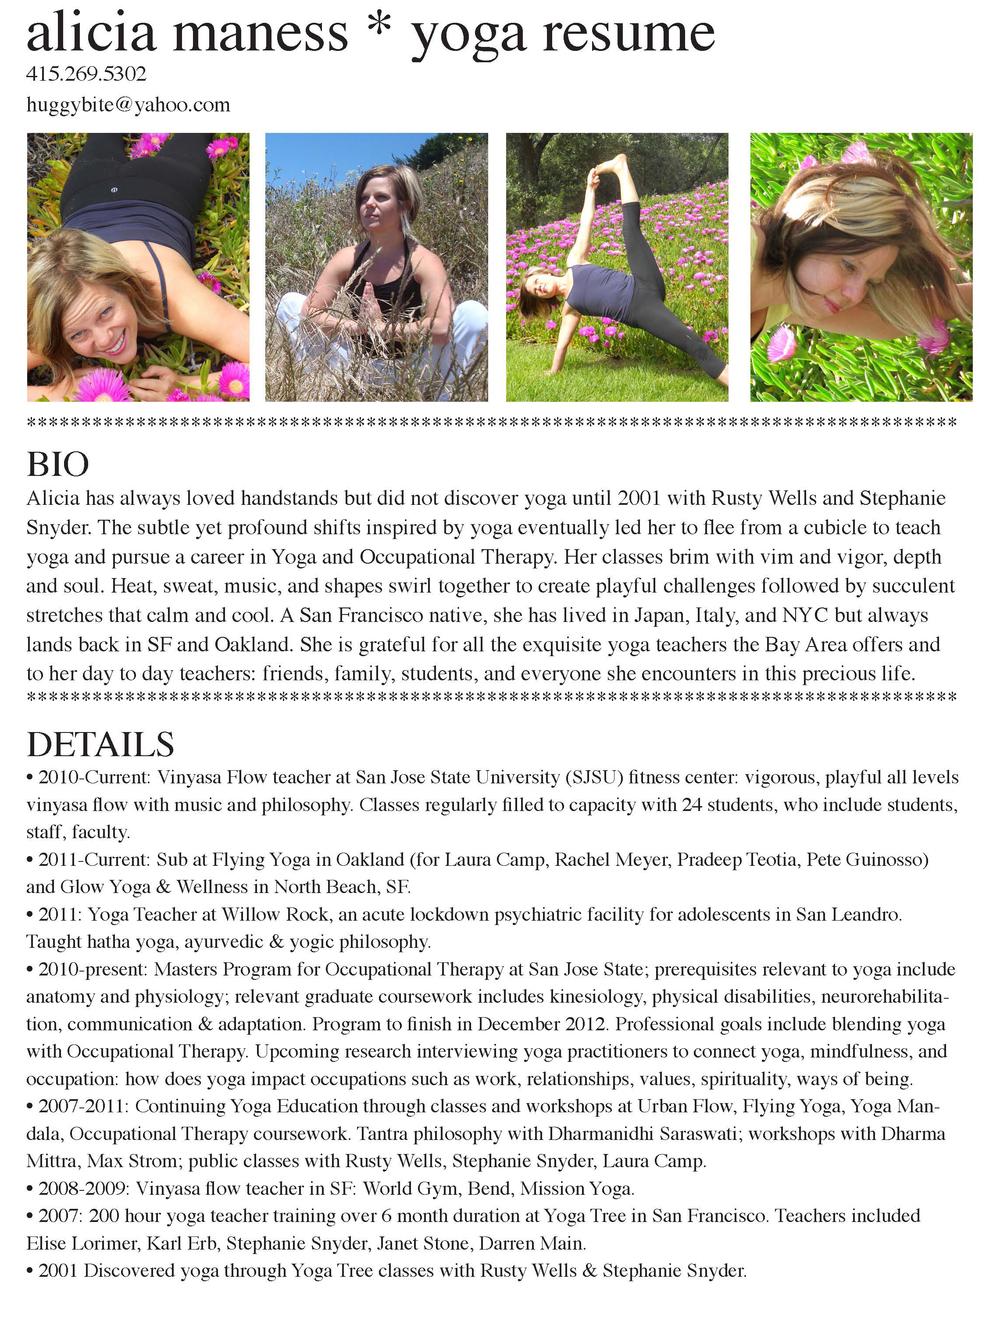 Resume - Yoga — Alicia Lofgren Therapeutics